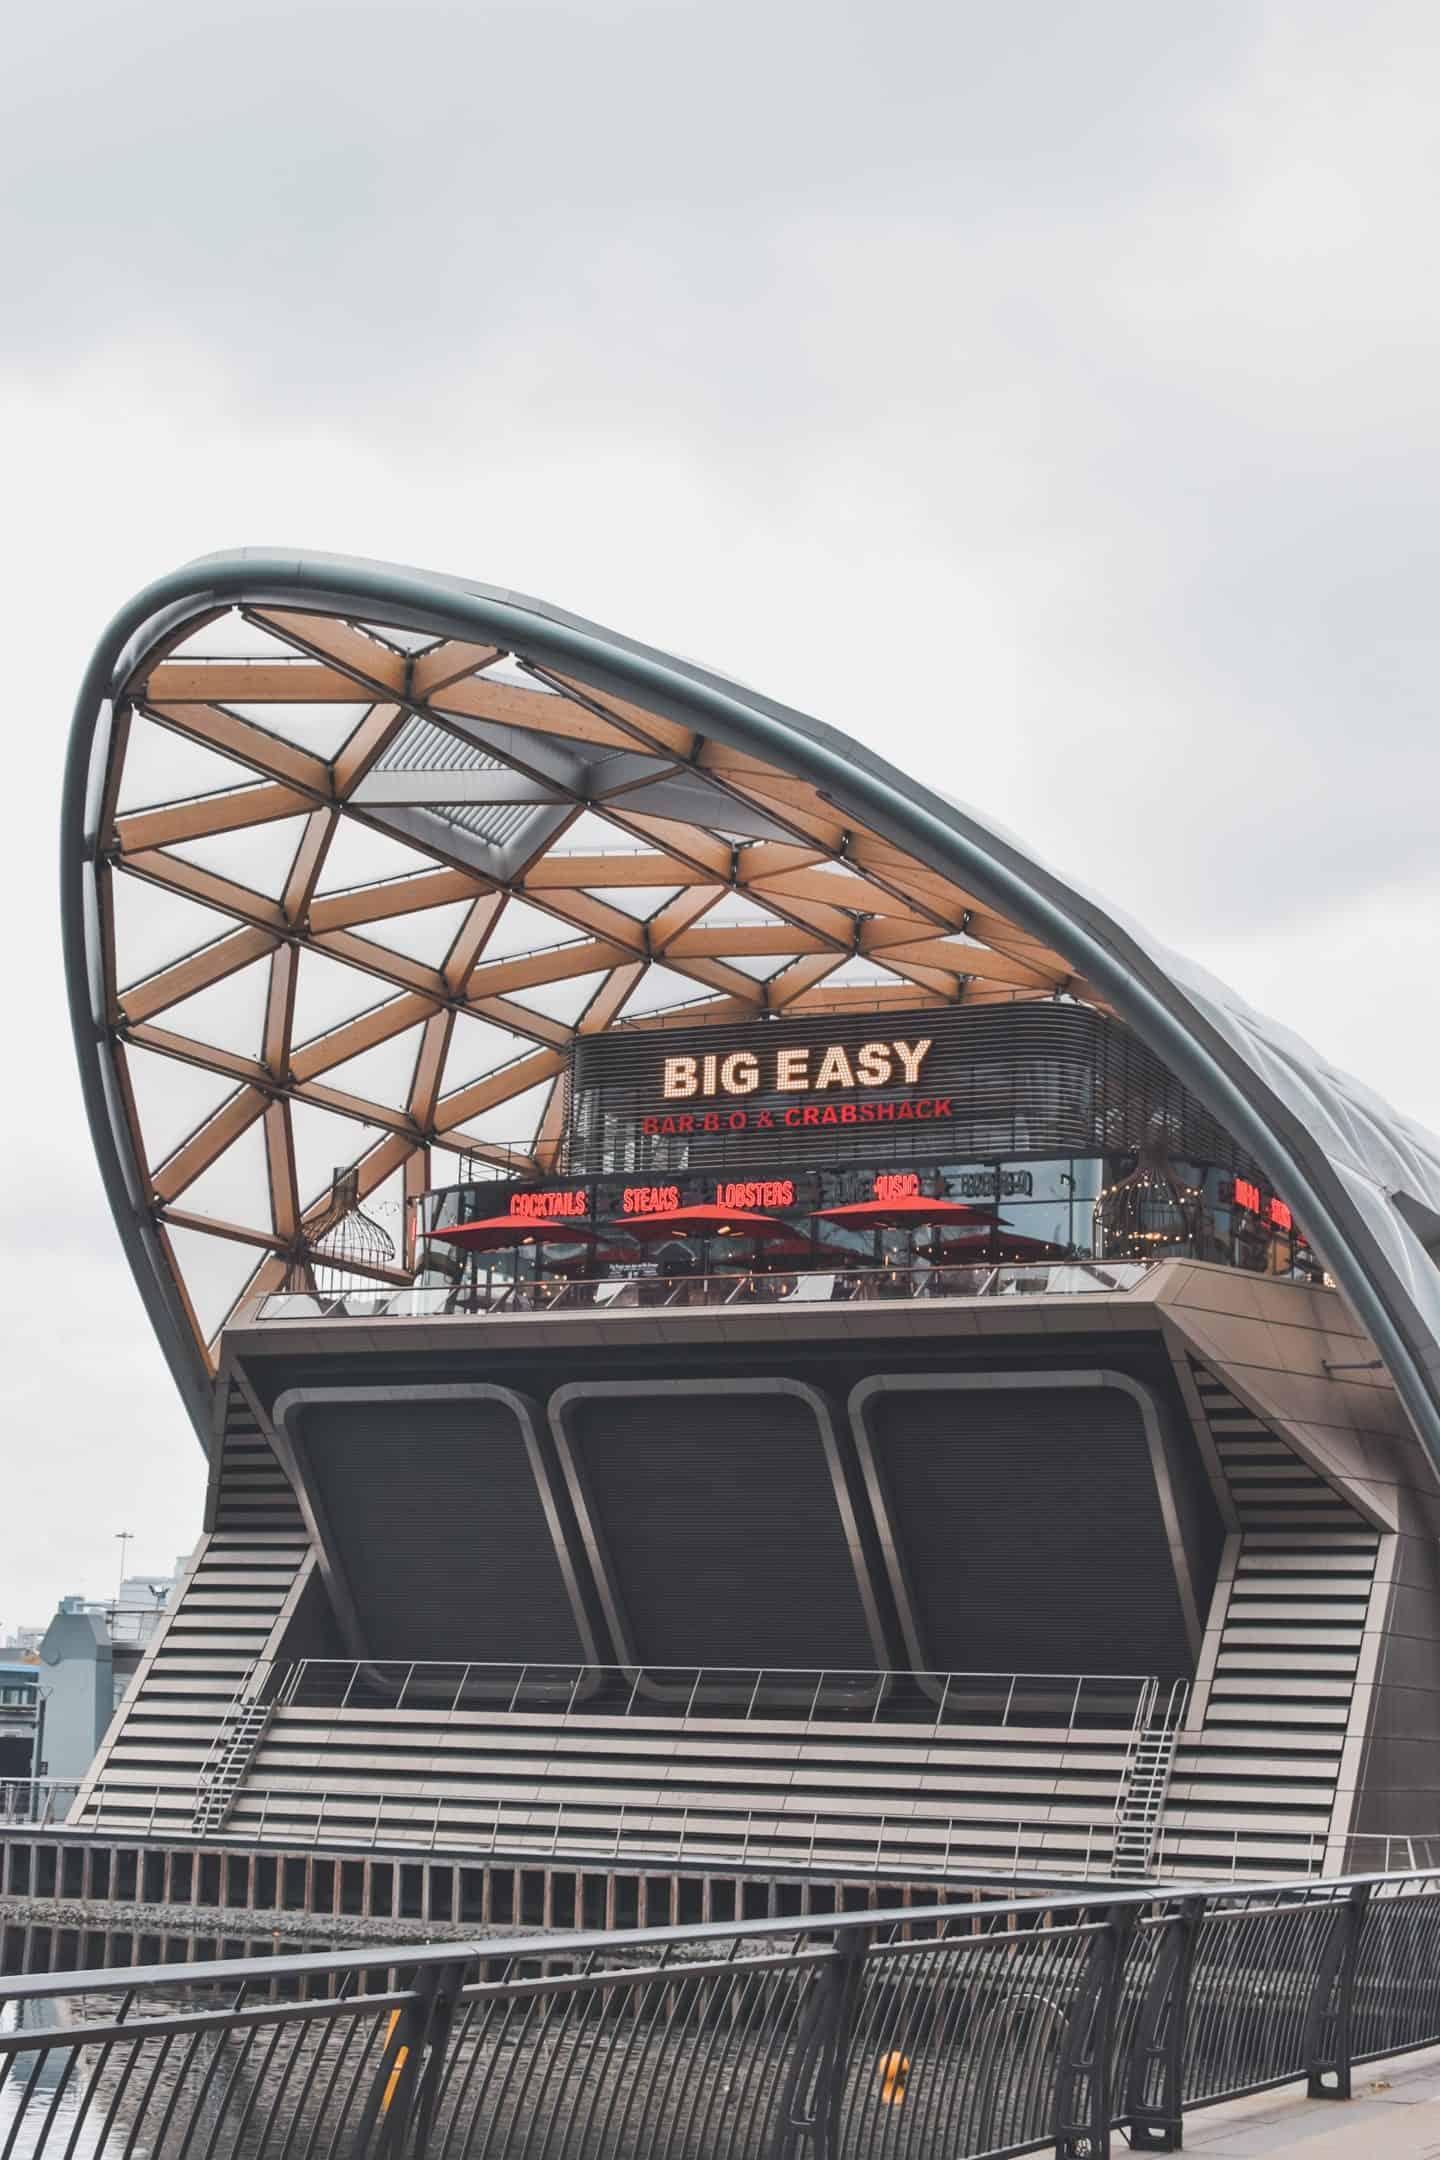 Outside-of-big-easy-Canary-Wharf